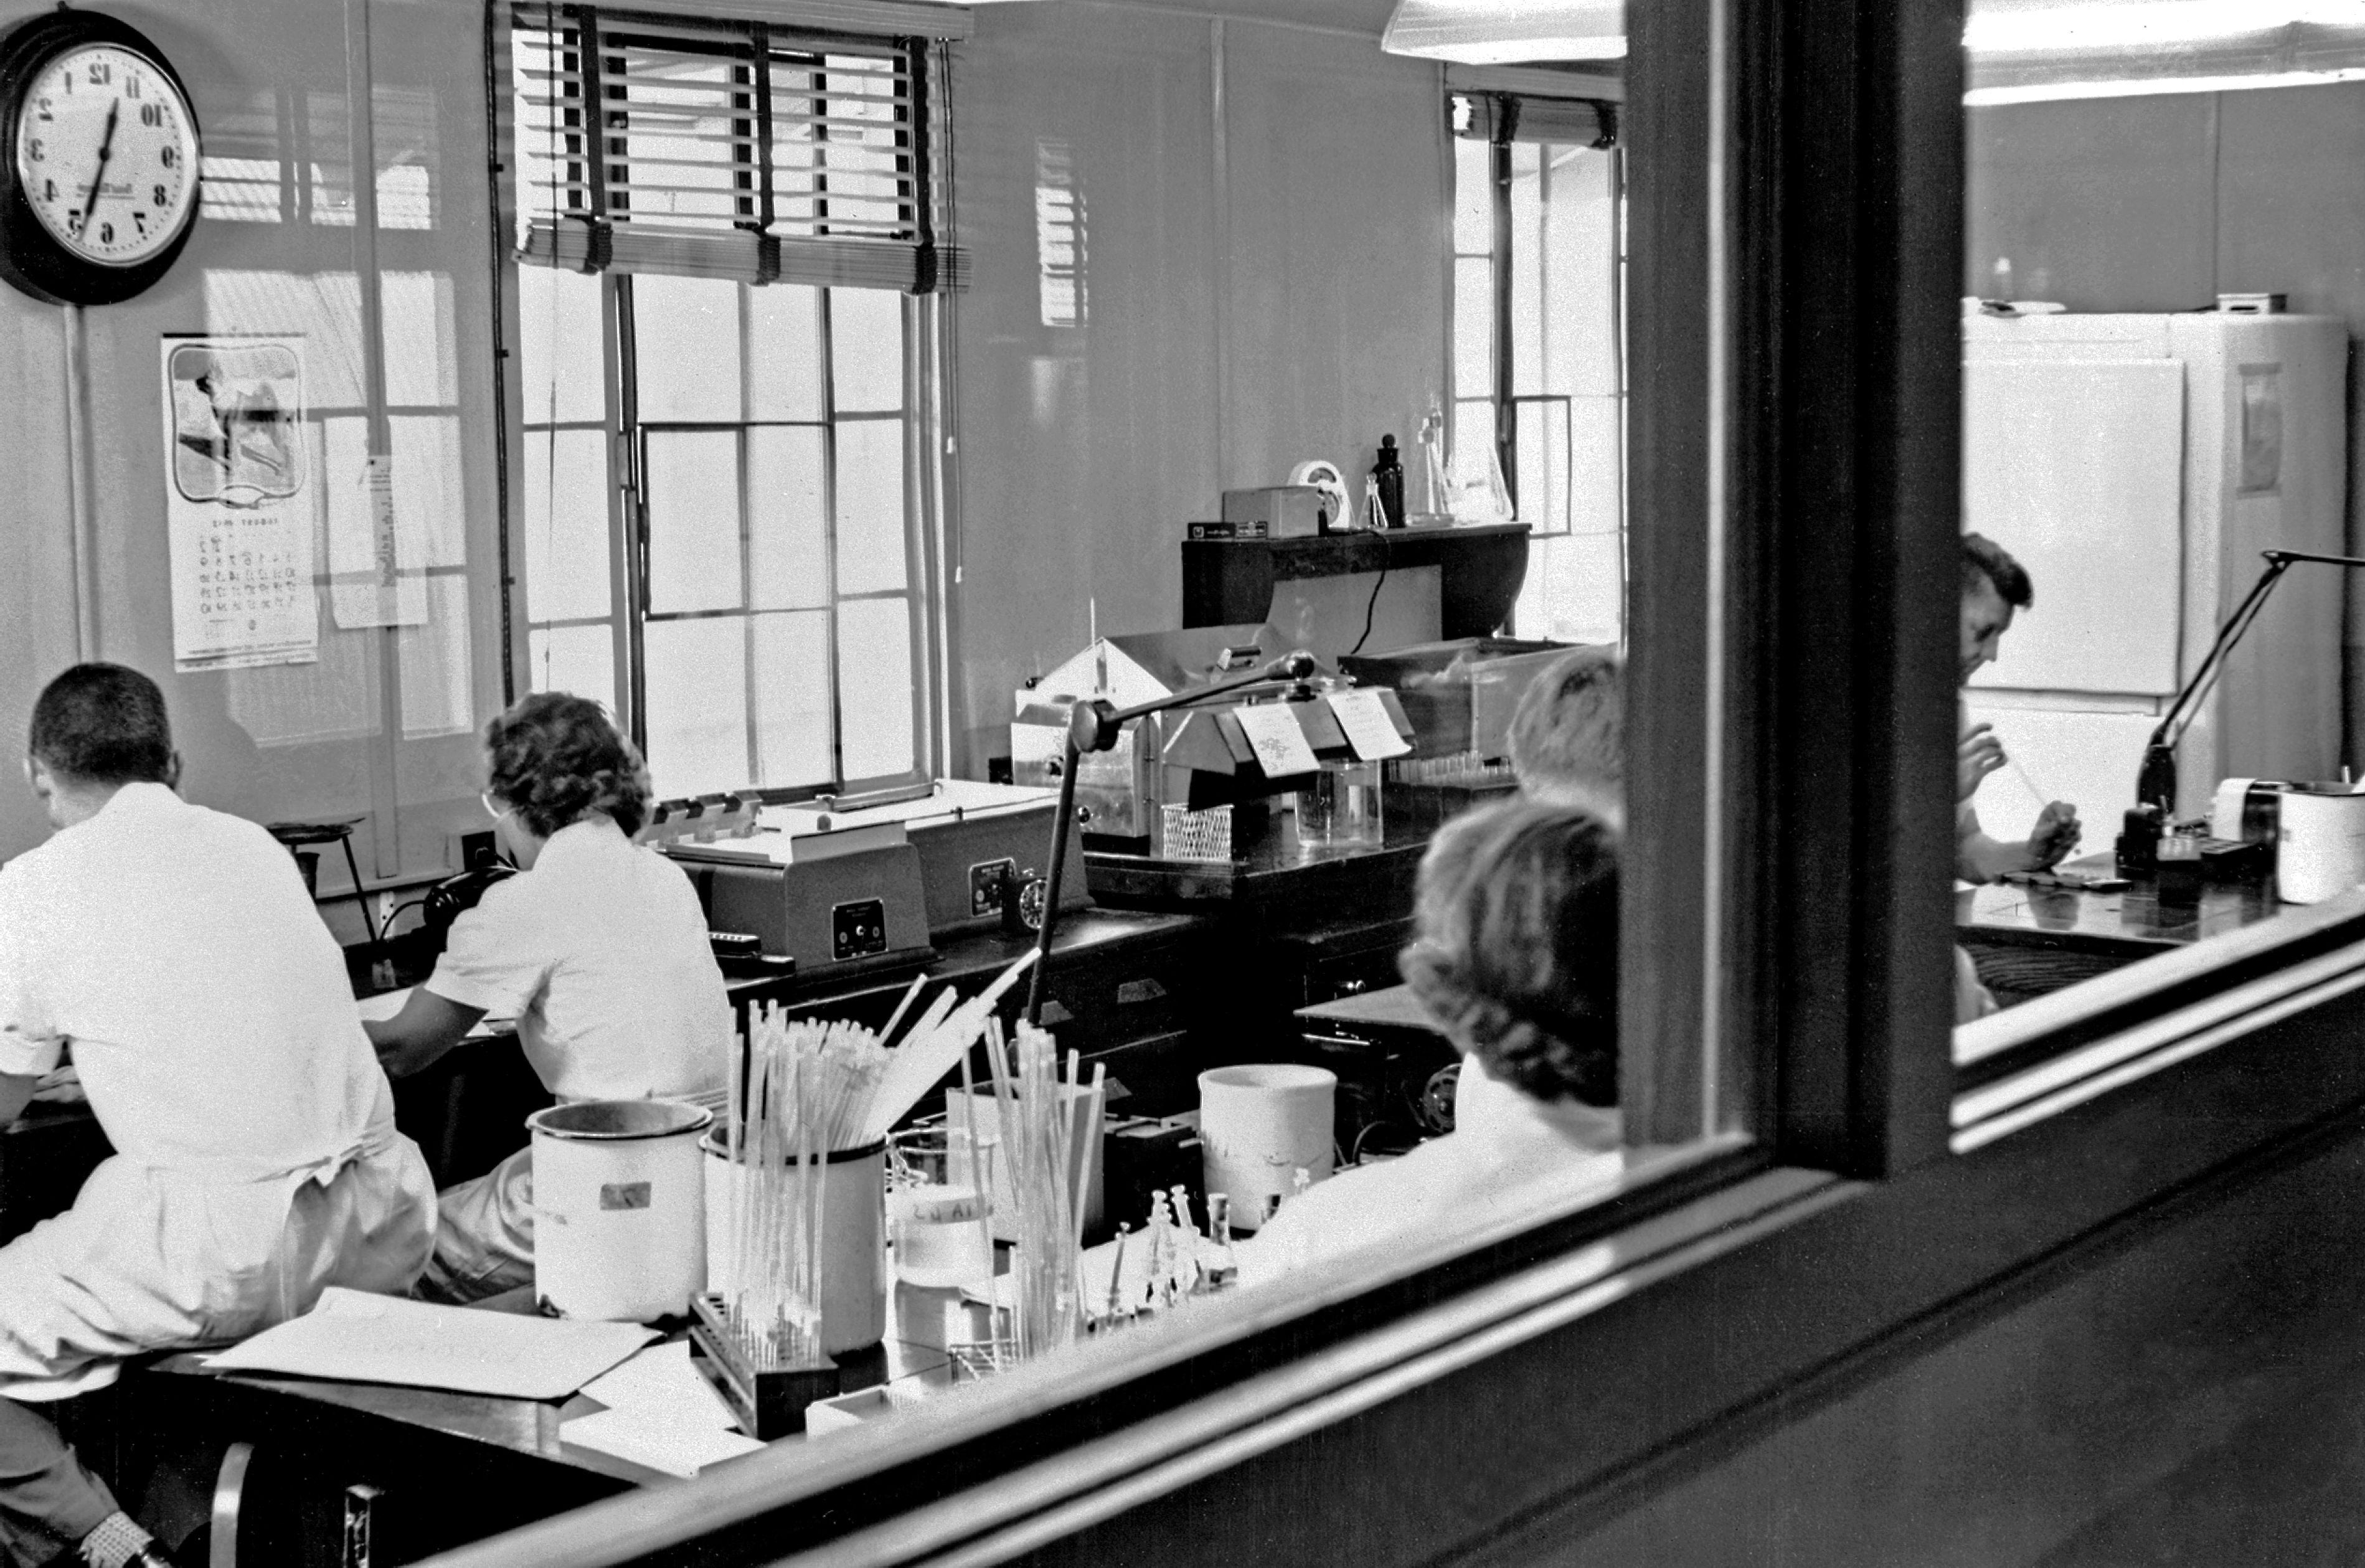 Examination facilities labor